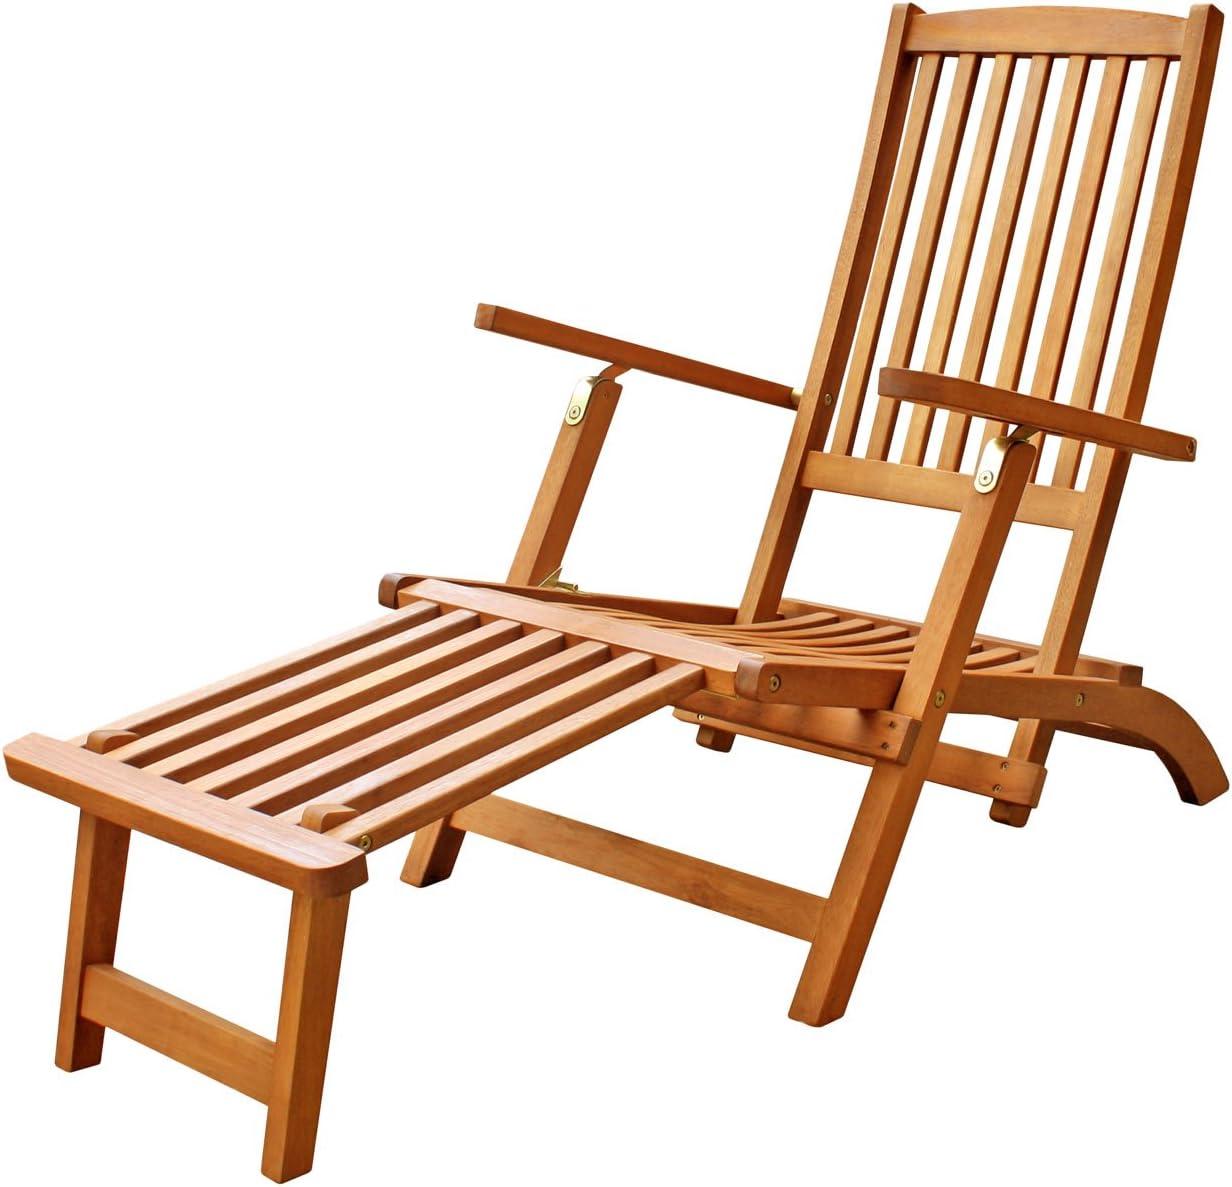 LuuNguyen Tommy Outdoor Hardwood Folding Ch Steamer Deck Time Be super welcome sale Lounge